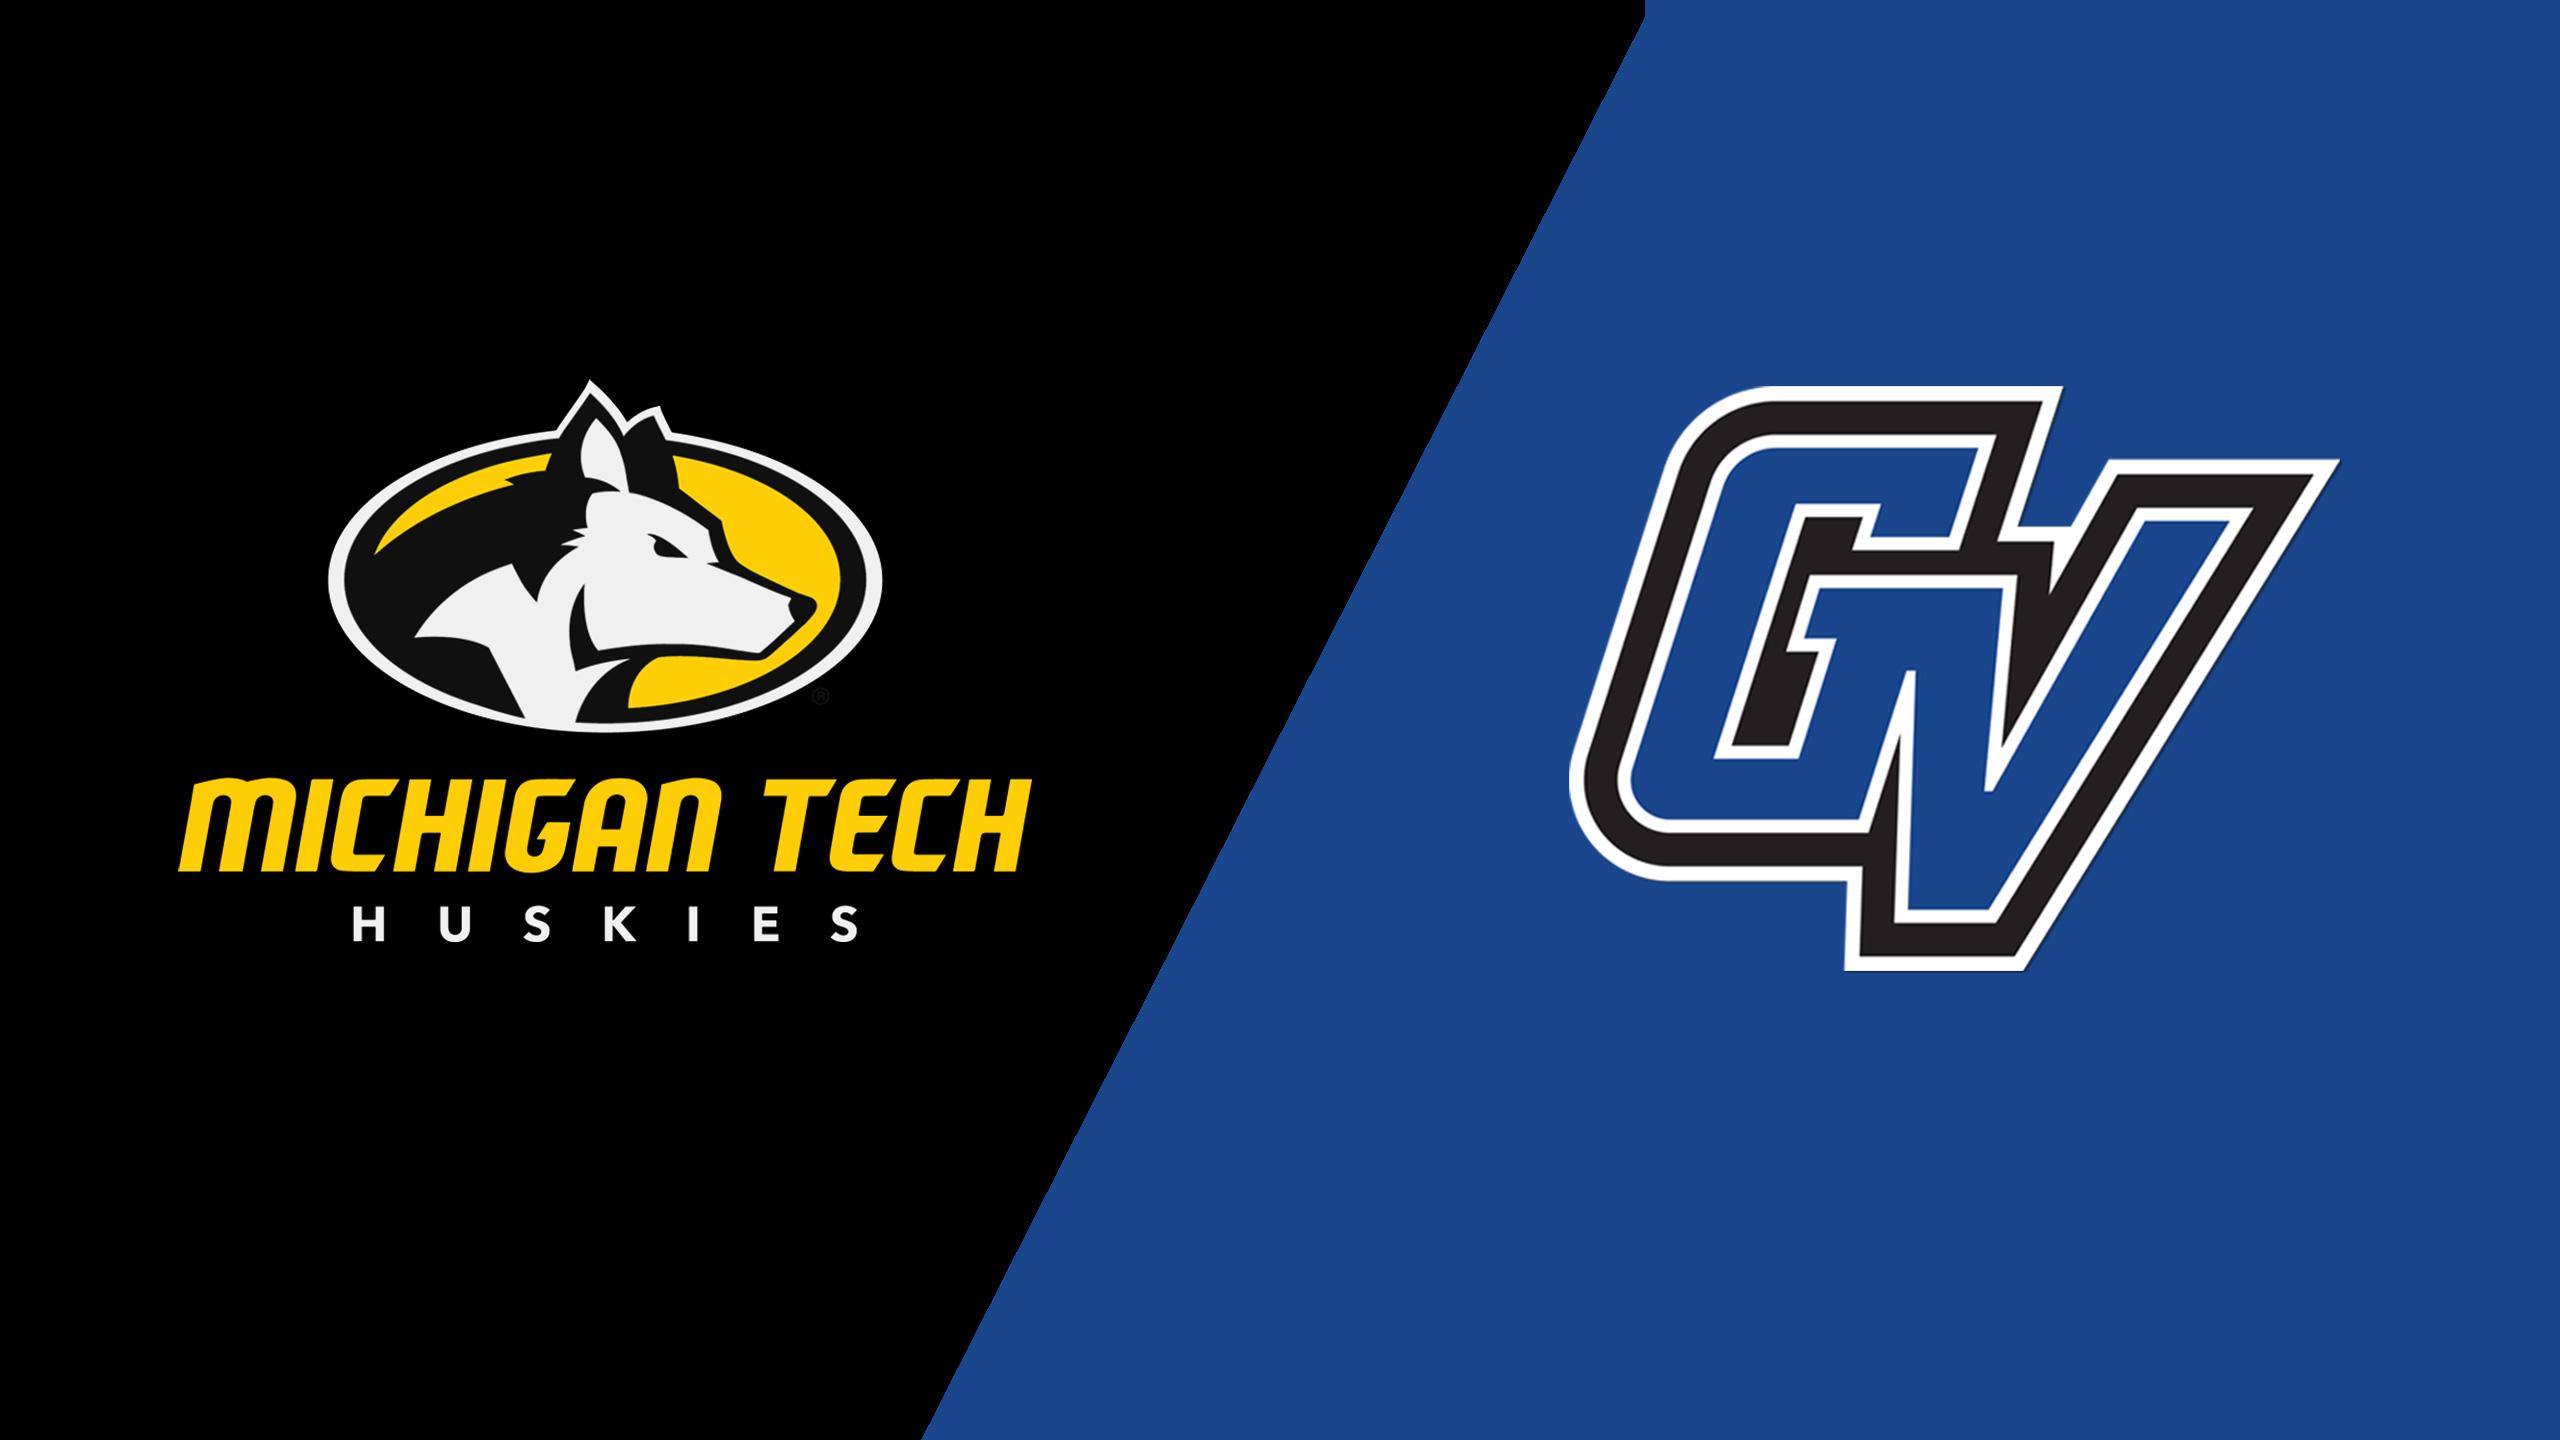 Michigan Tech vs. Grand Valley State (Football)